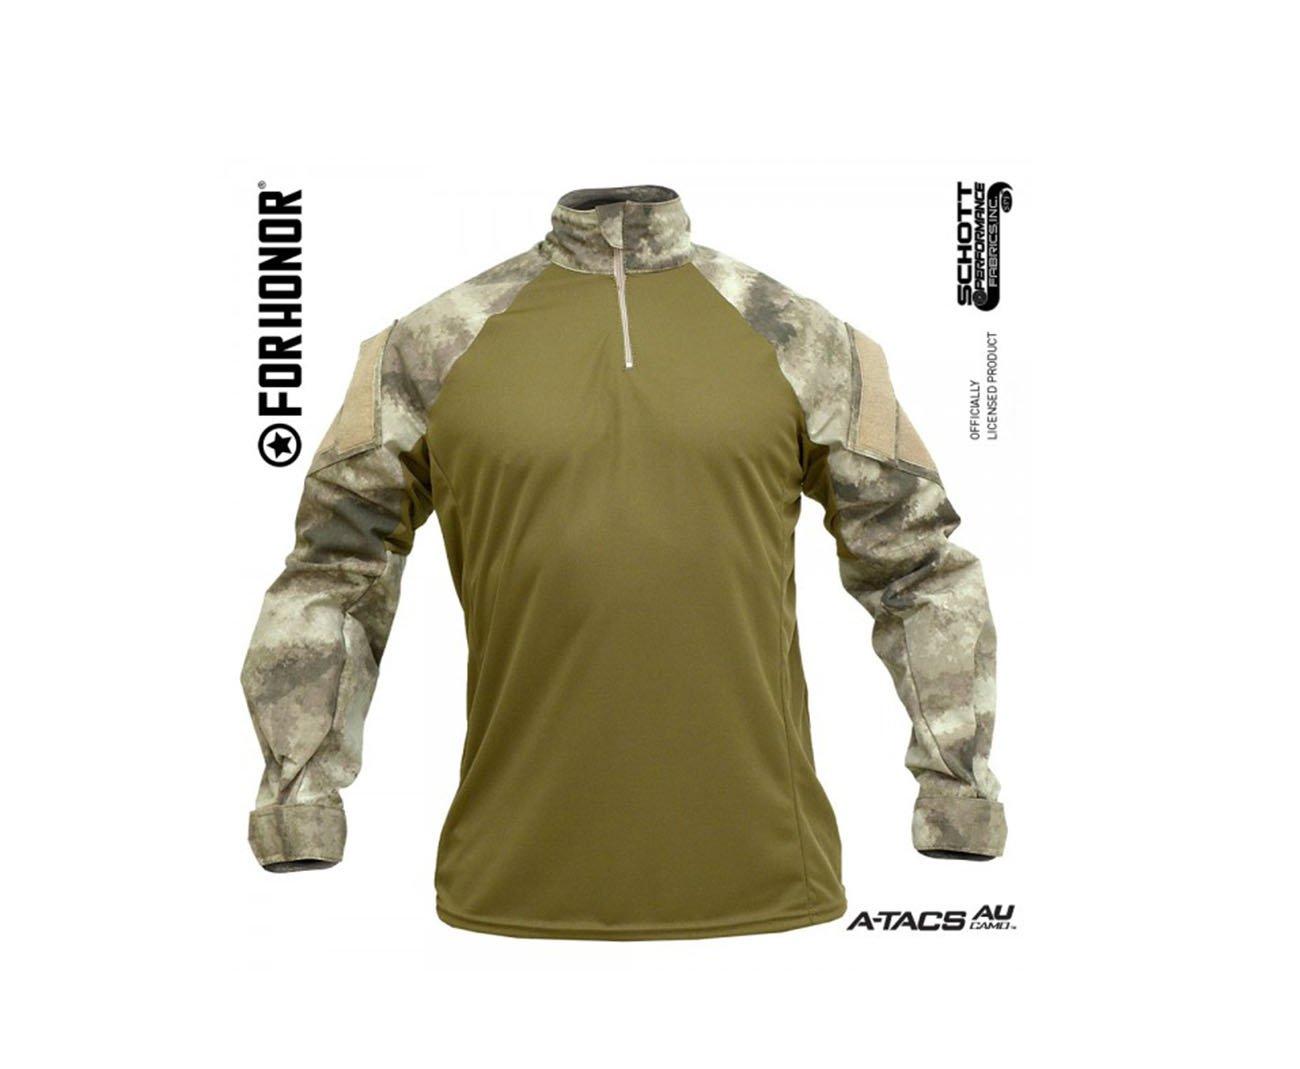 Camisa De Combate Forhonor 711 Camuflado Au (combat Shirt)